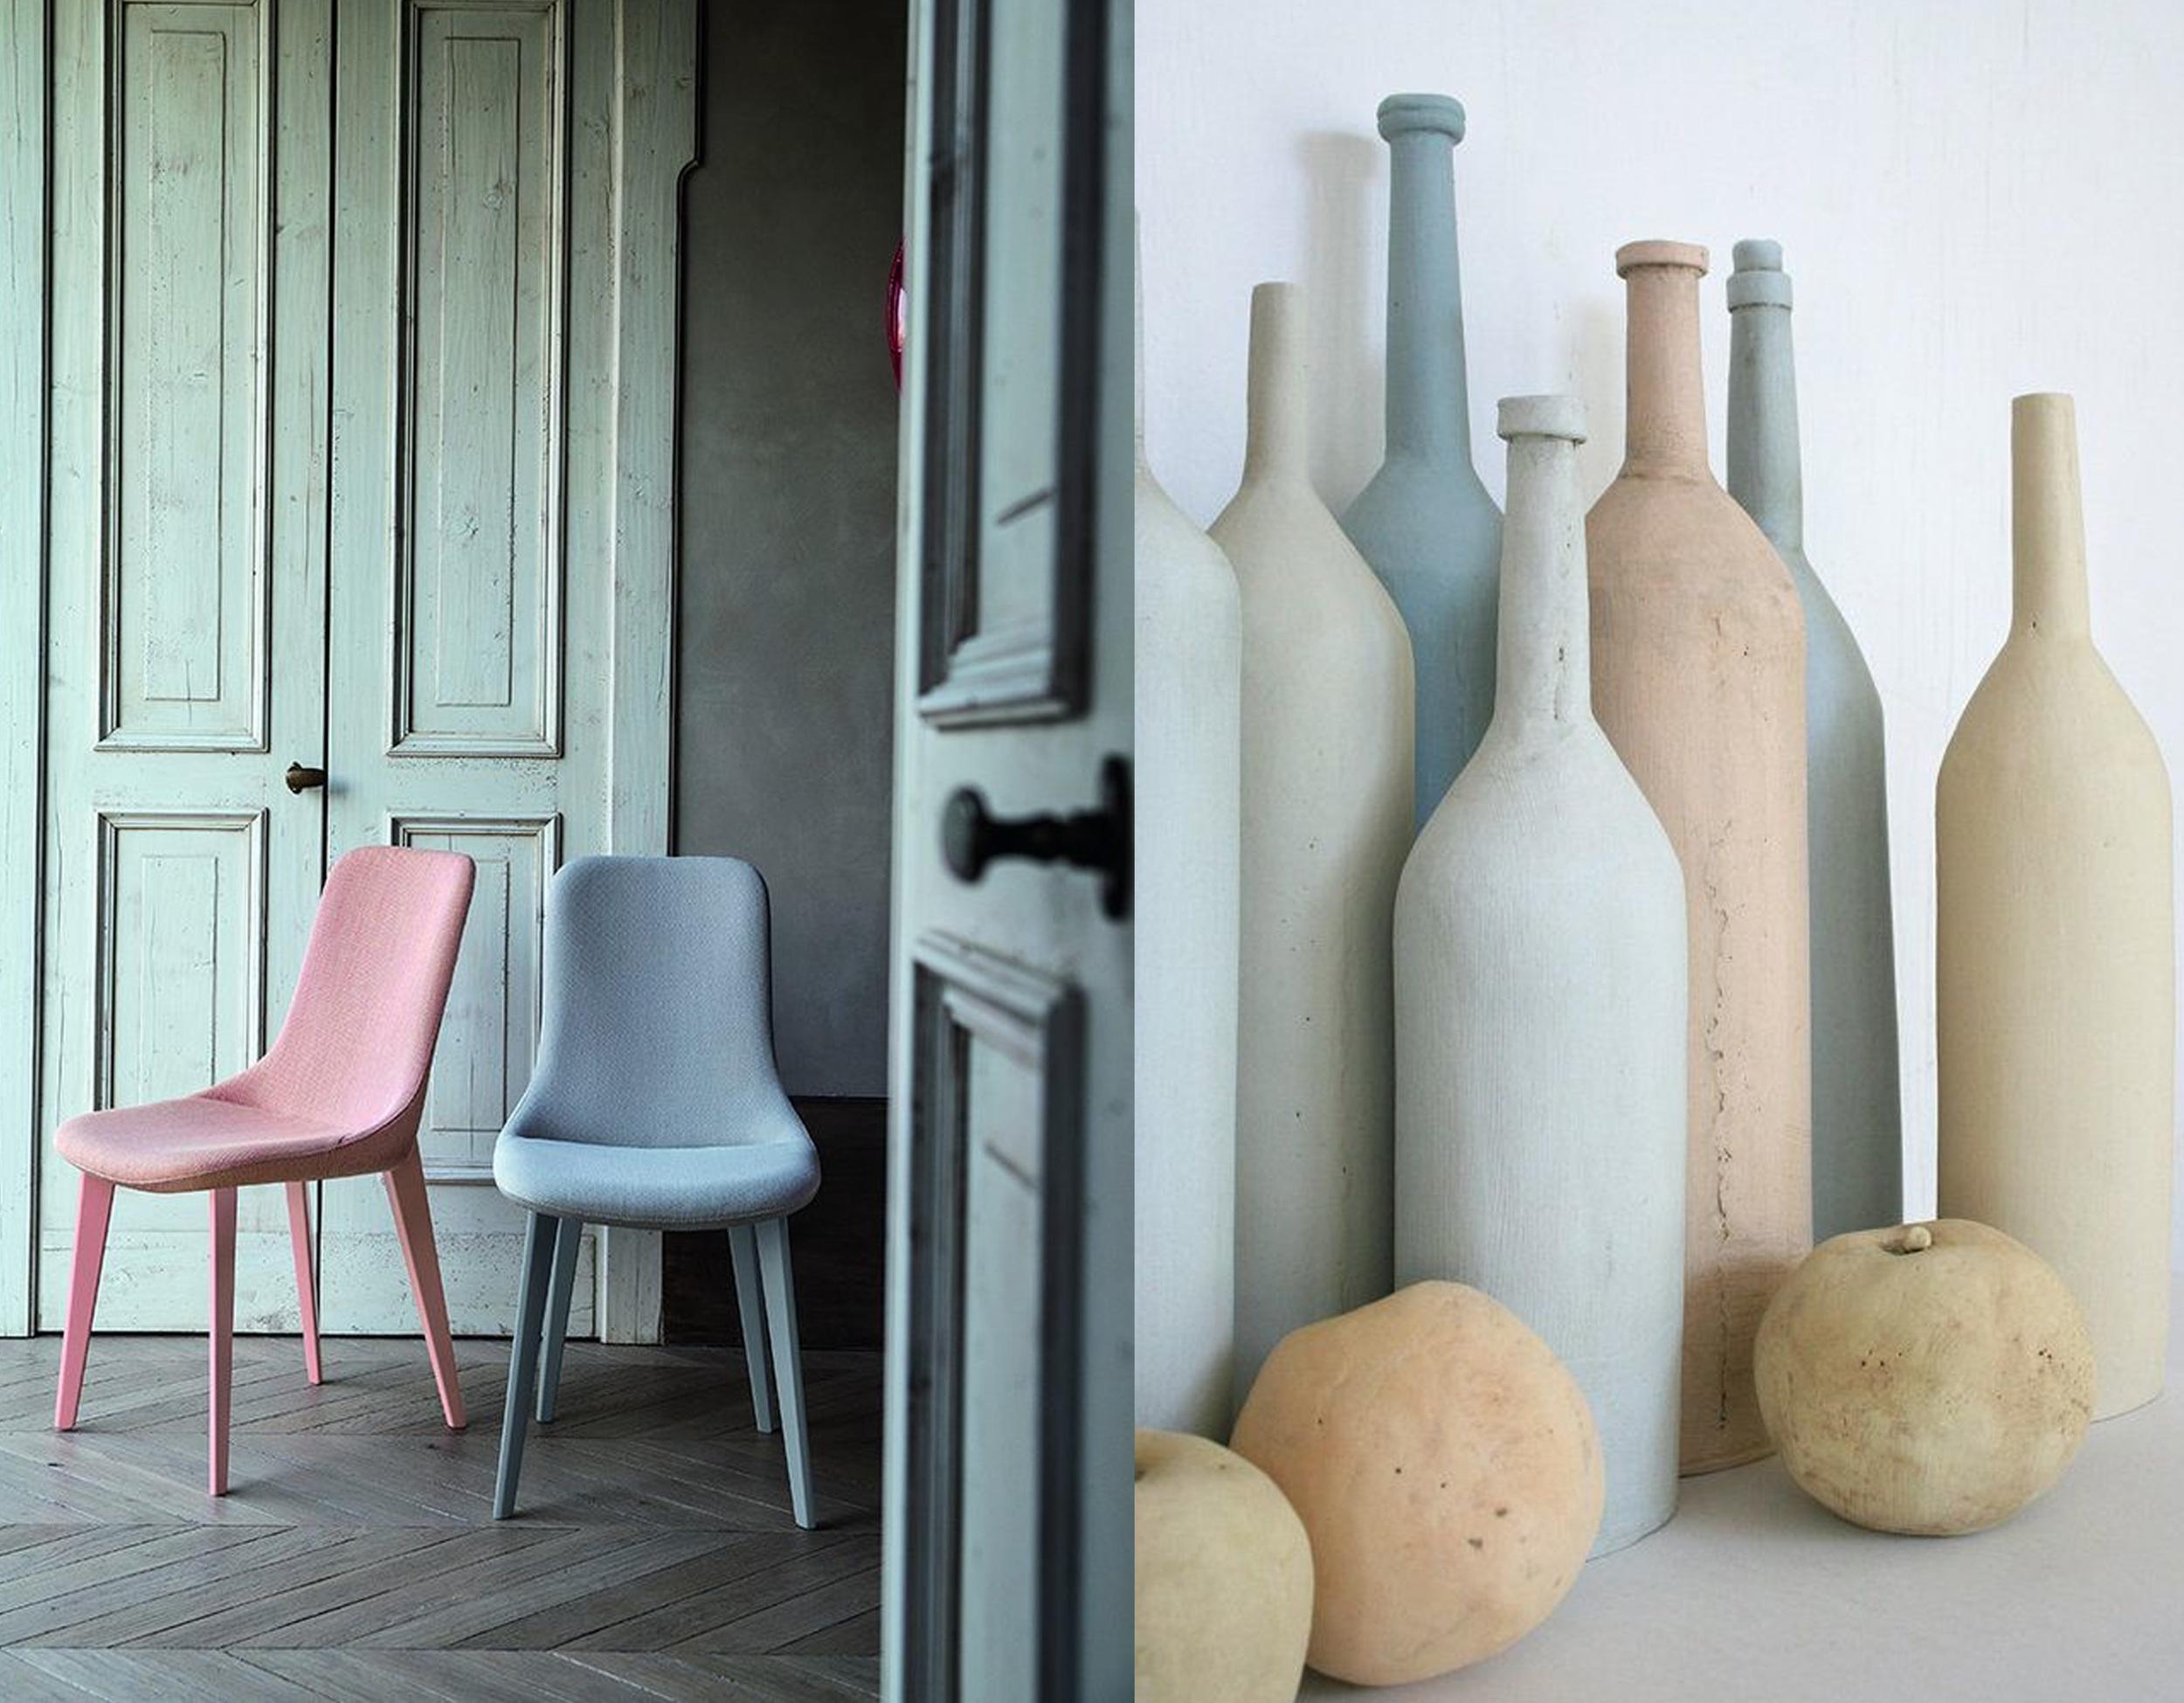 image via  Resource Furniture  -  House of Ceramics